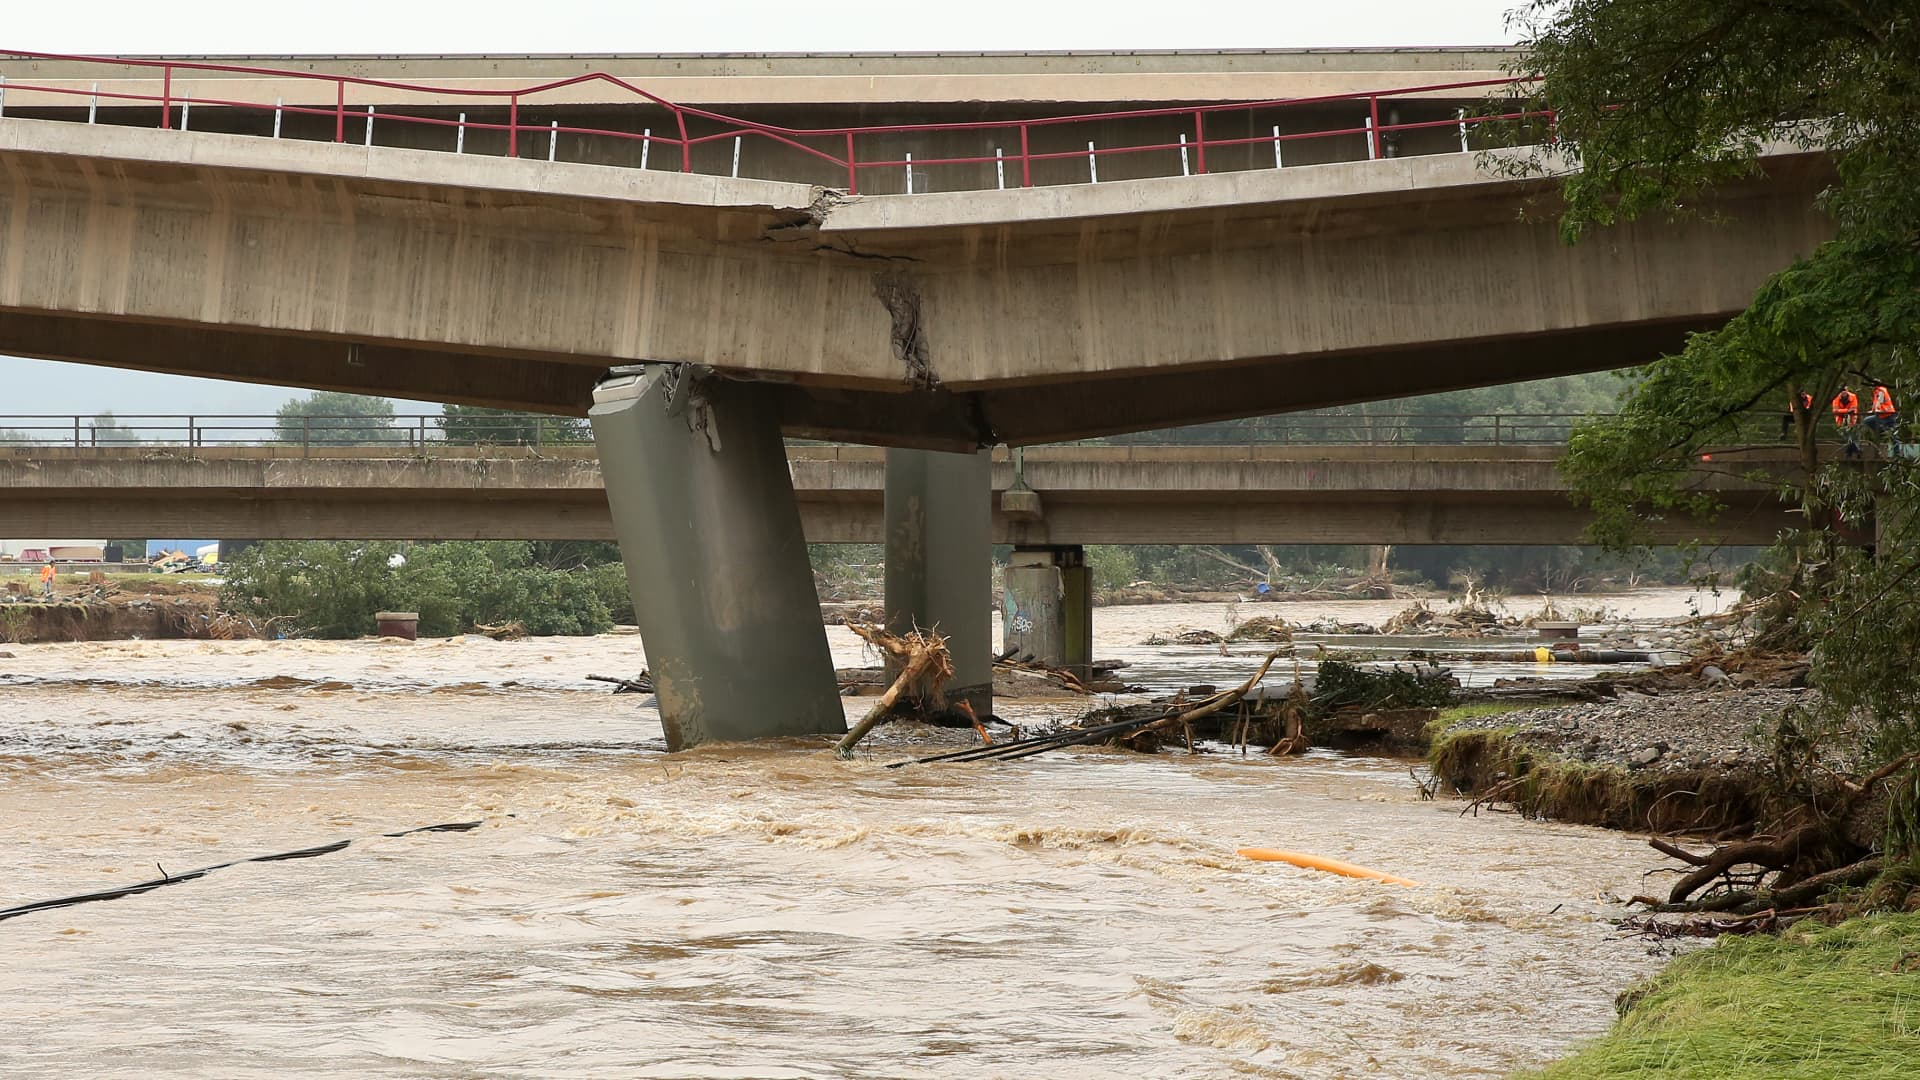 SINZIG, GERMANY - JULY 16: A broken bridge is seen after a major flood in the Ahrlweiler district of Germany's mountainous Eifel area on July 16, 2021 in the village of Sinzig, Germany.